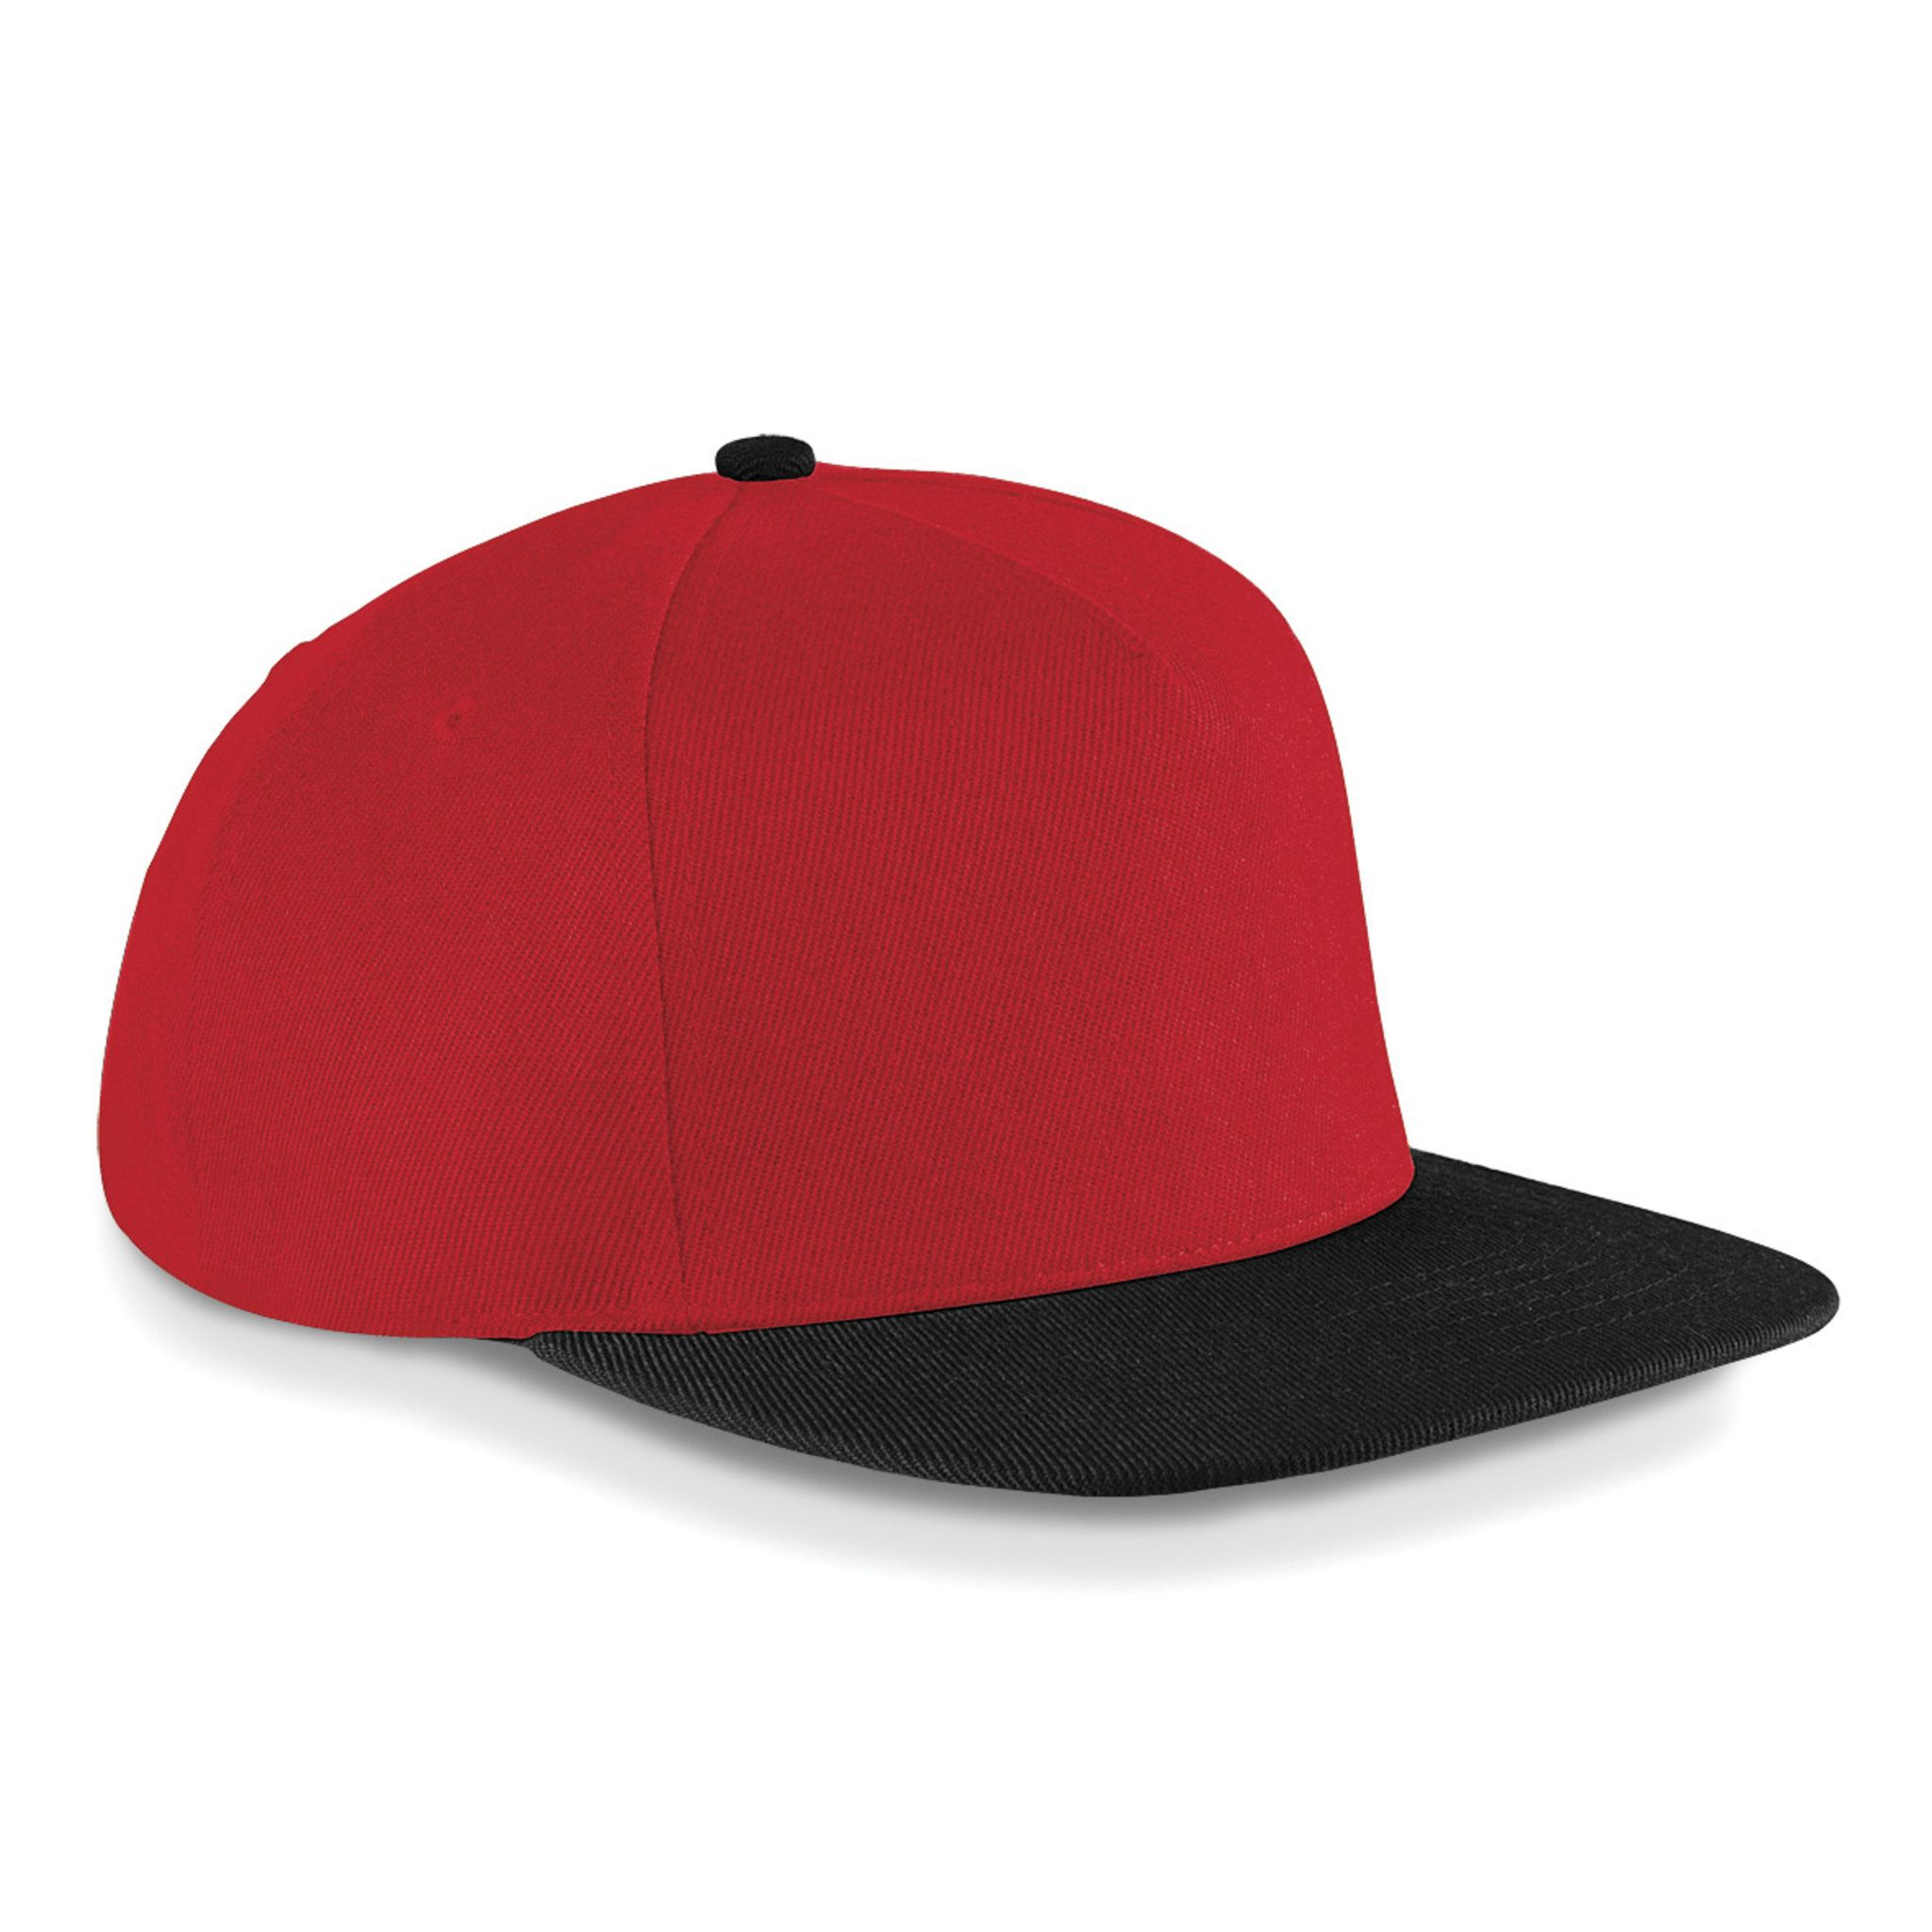 BLACK & CLASSIC RED